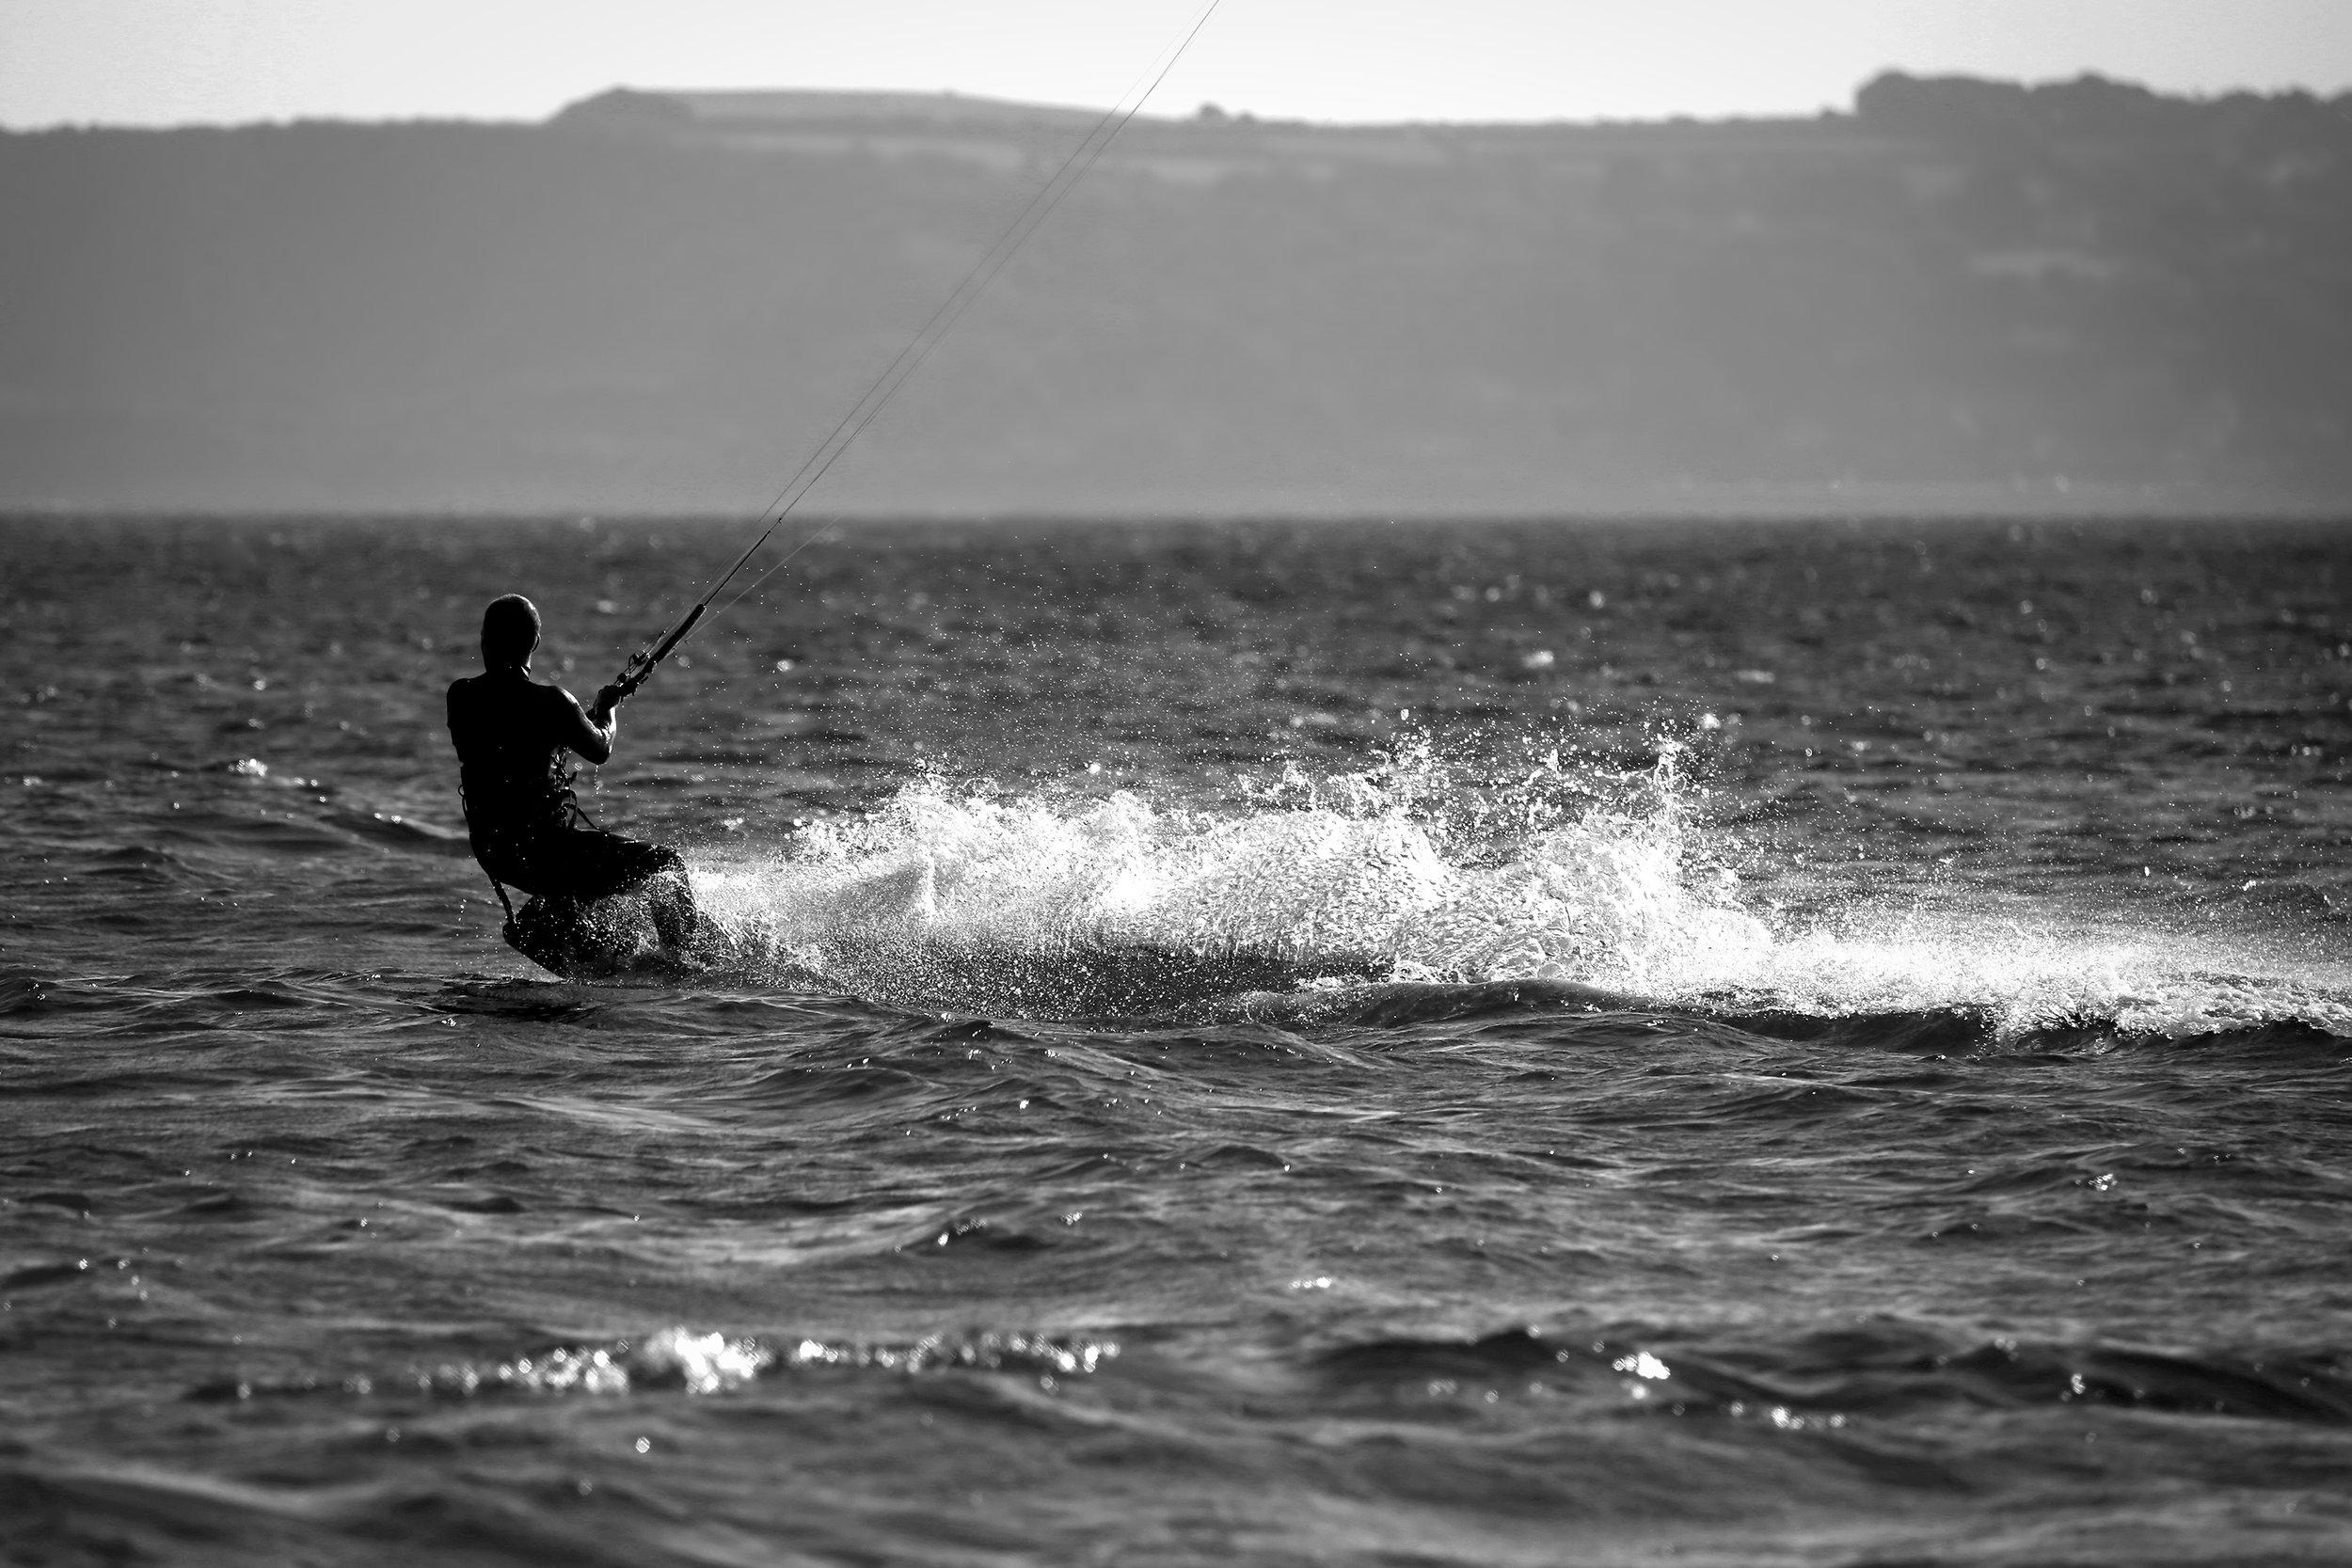 windsurf 5.jpeg